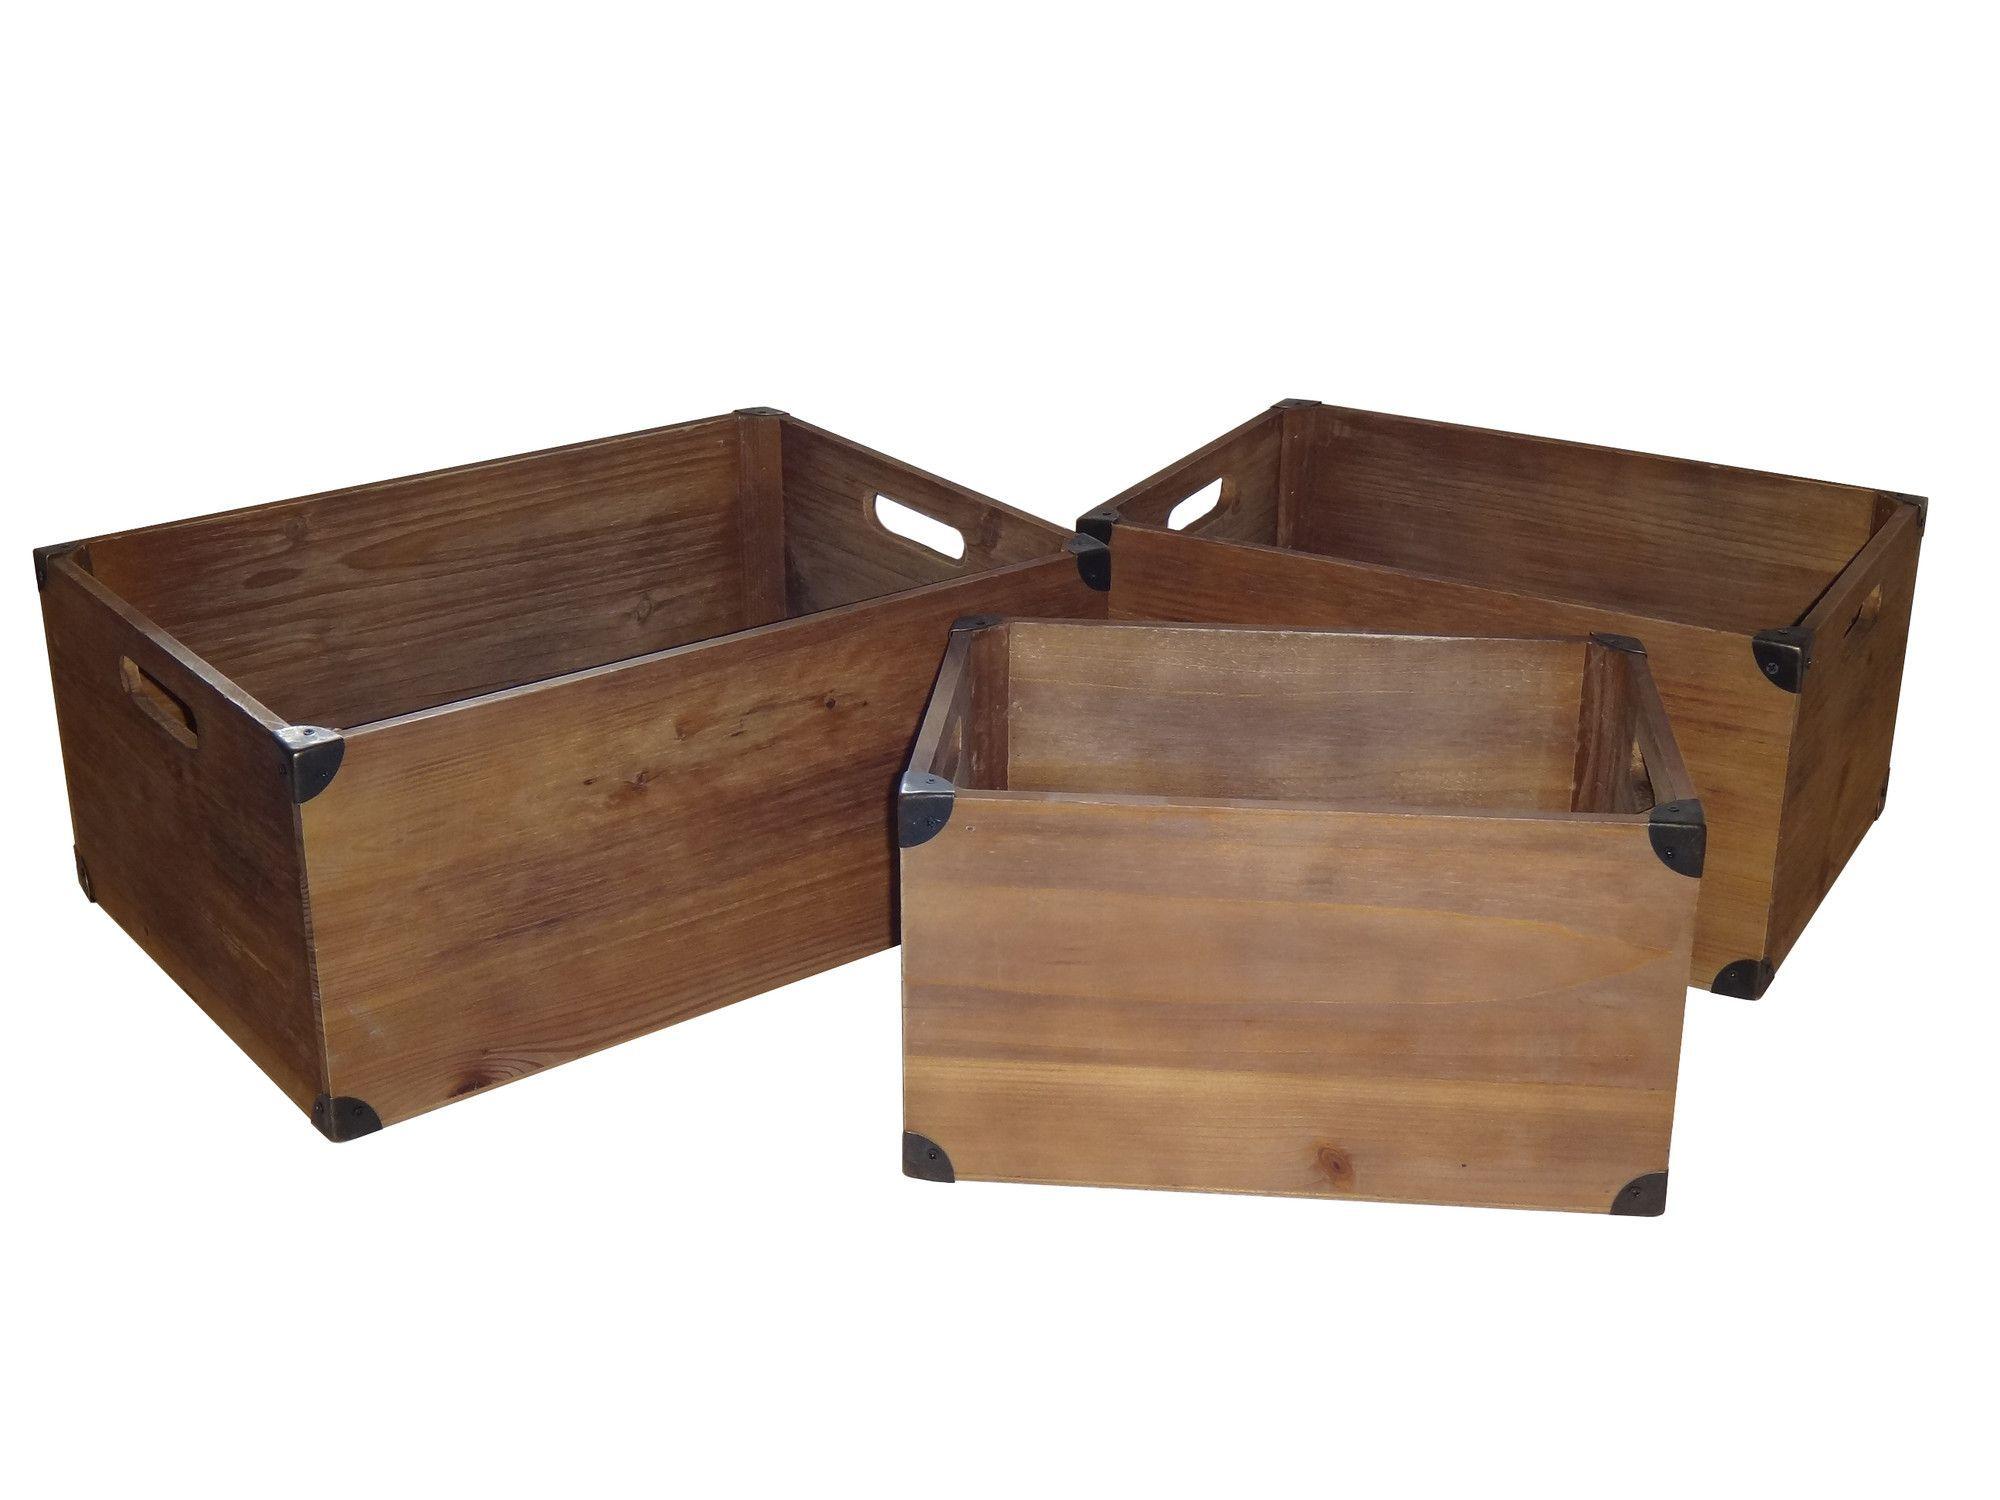 3 Piece Wood Slat Crate Set